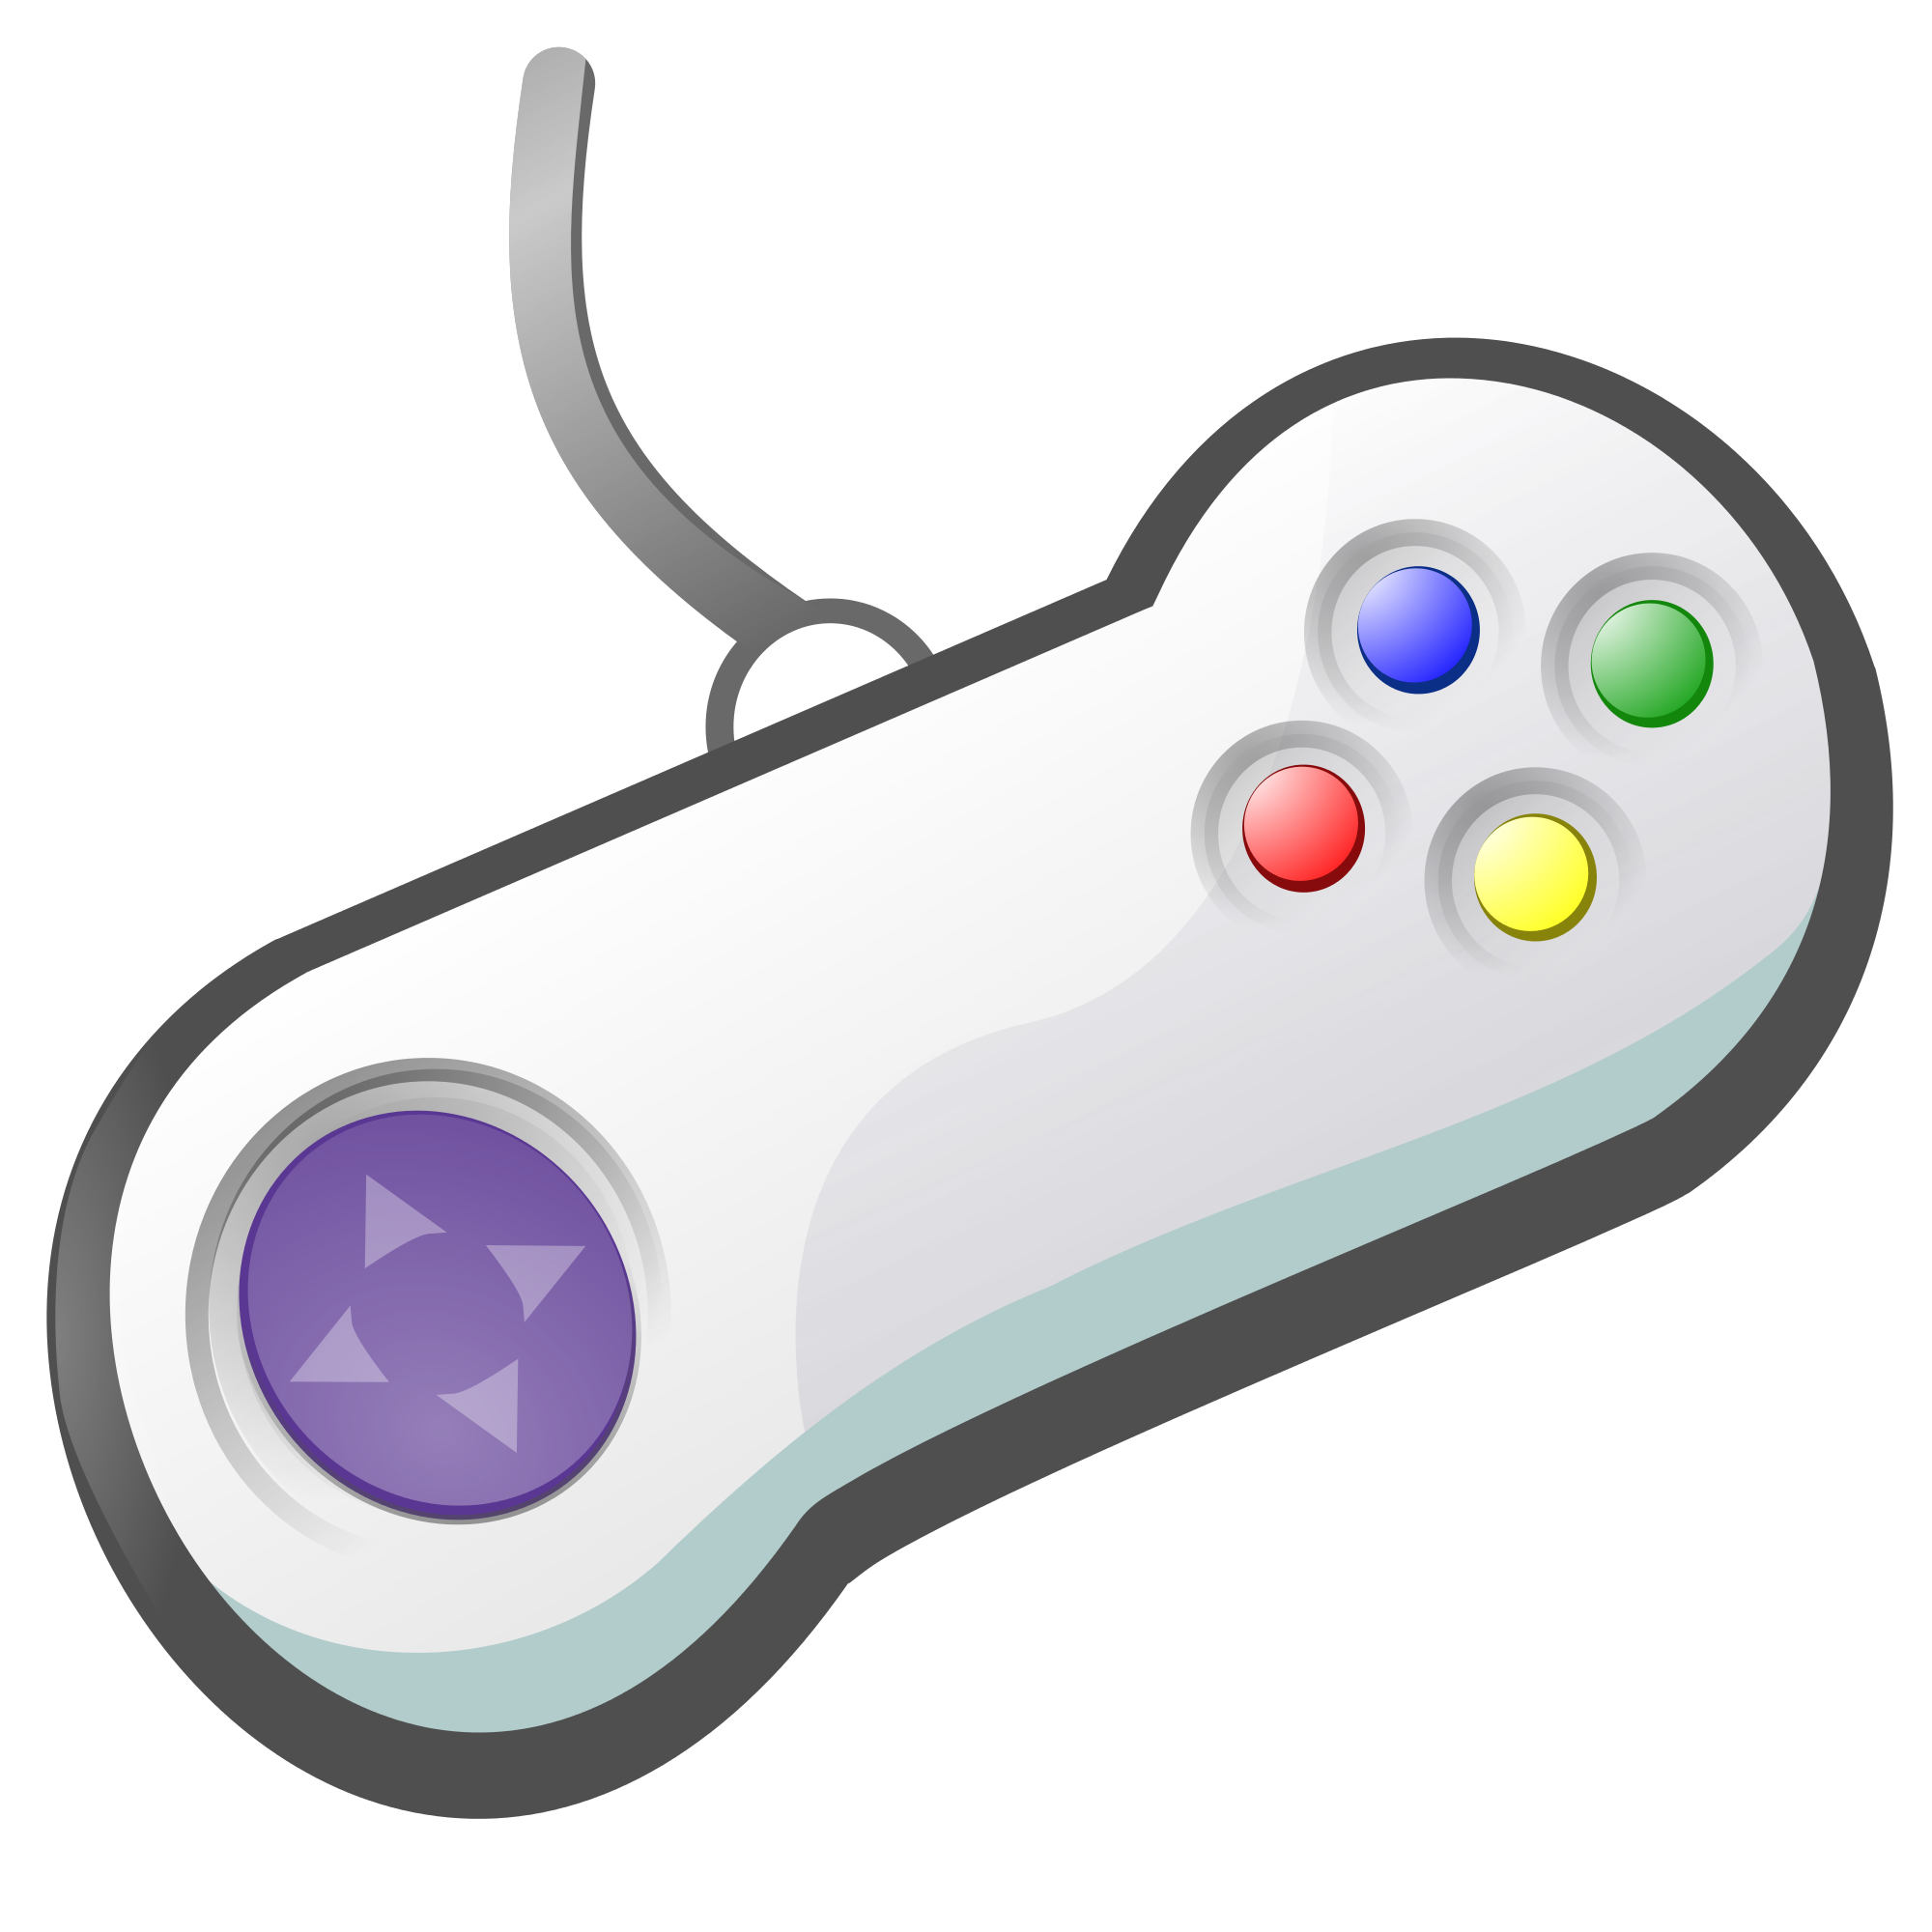 Open PlusPng.com  - Gamepad PNG